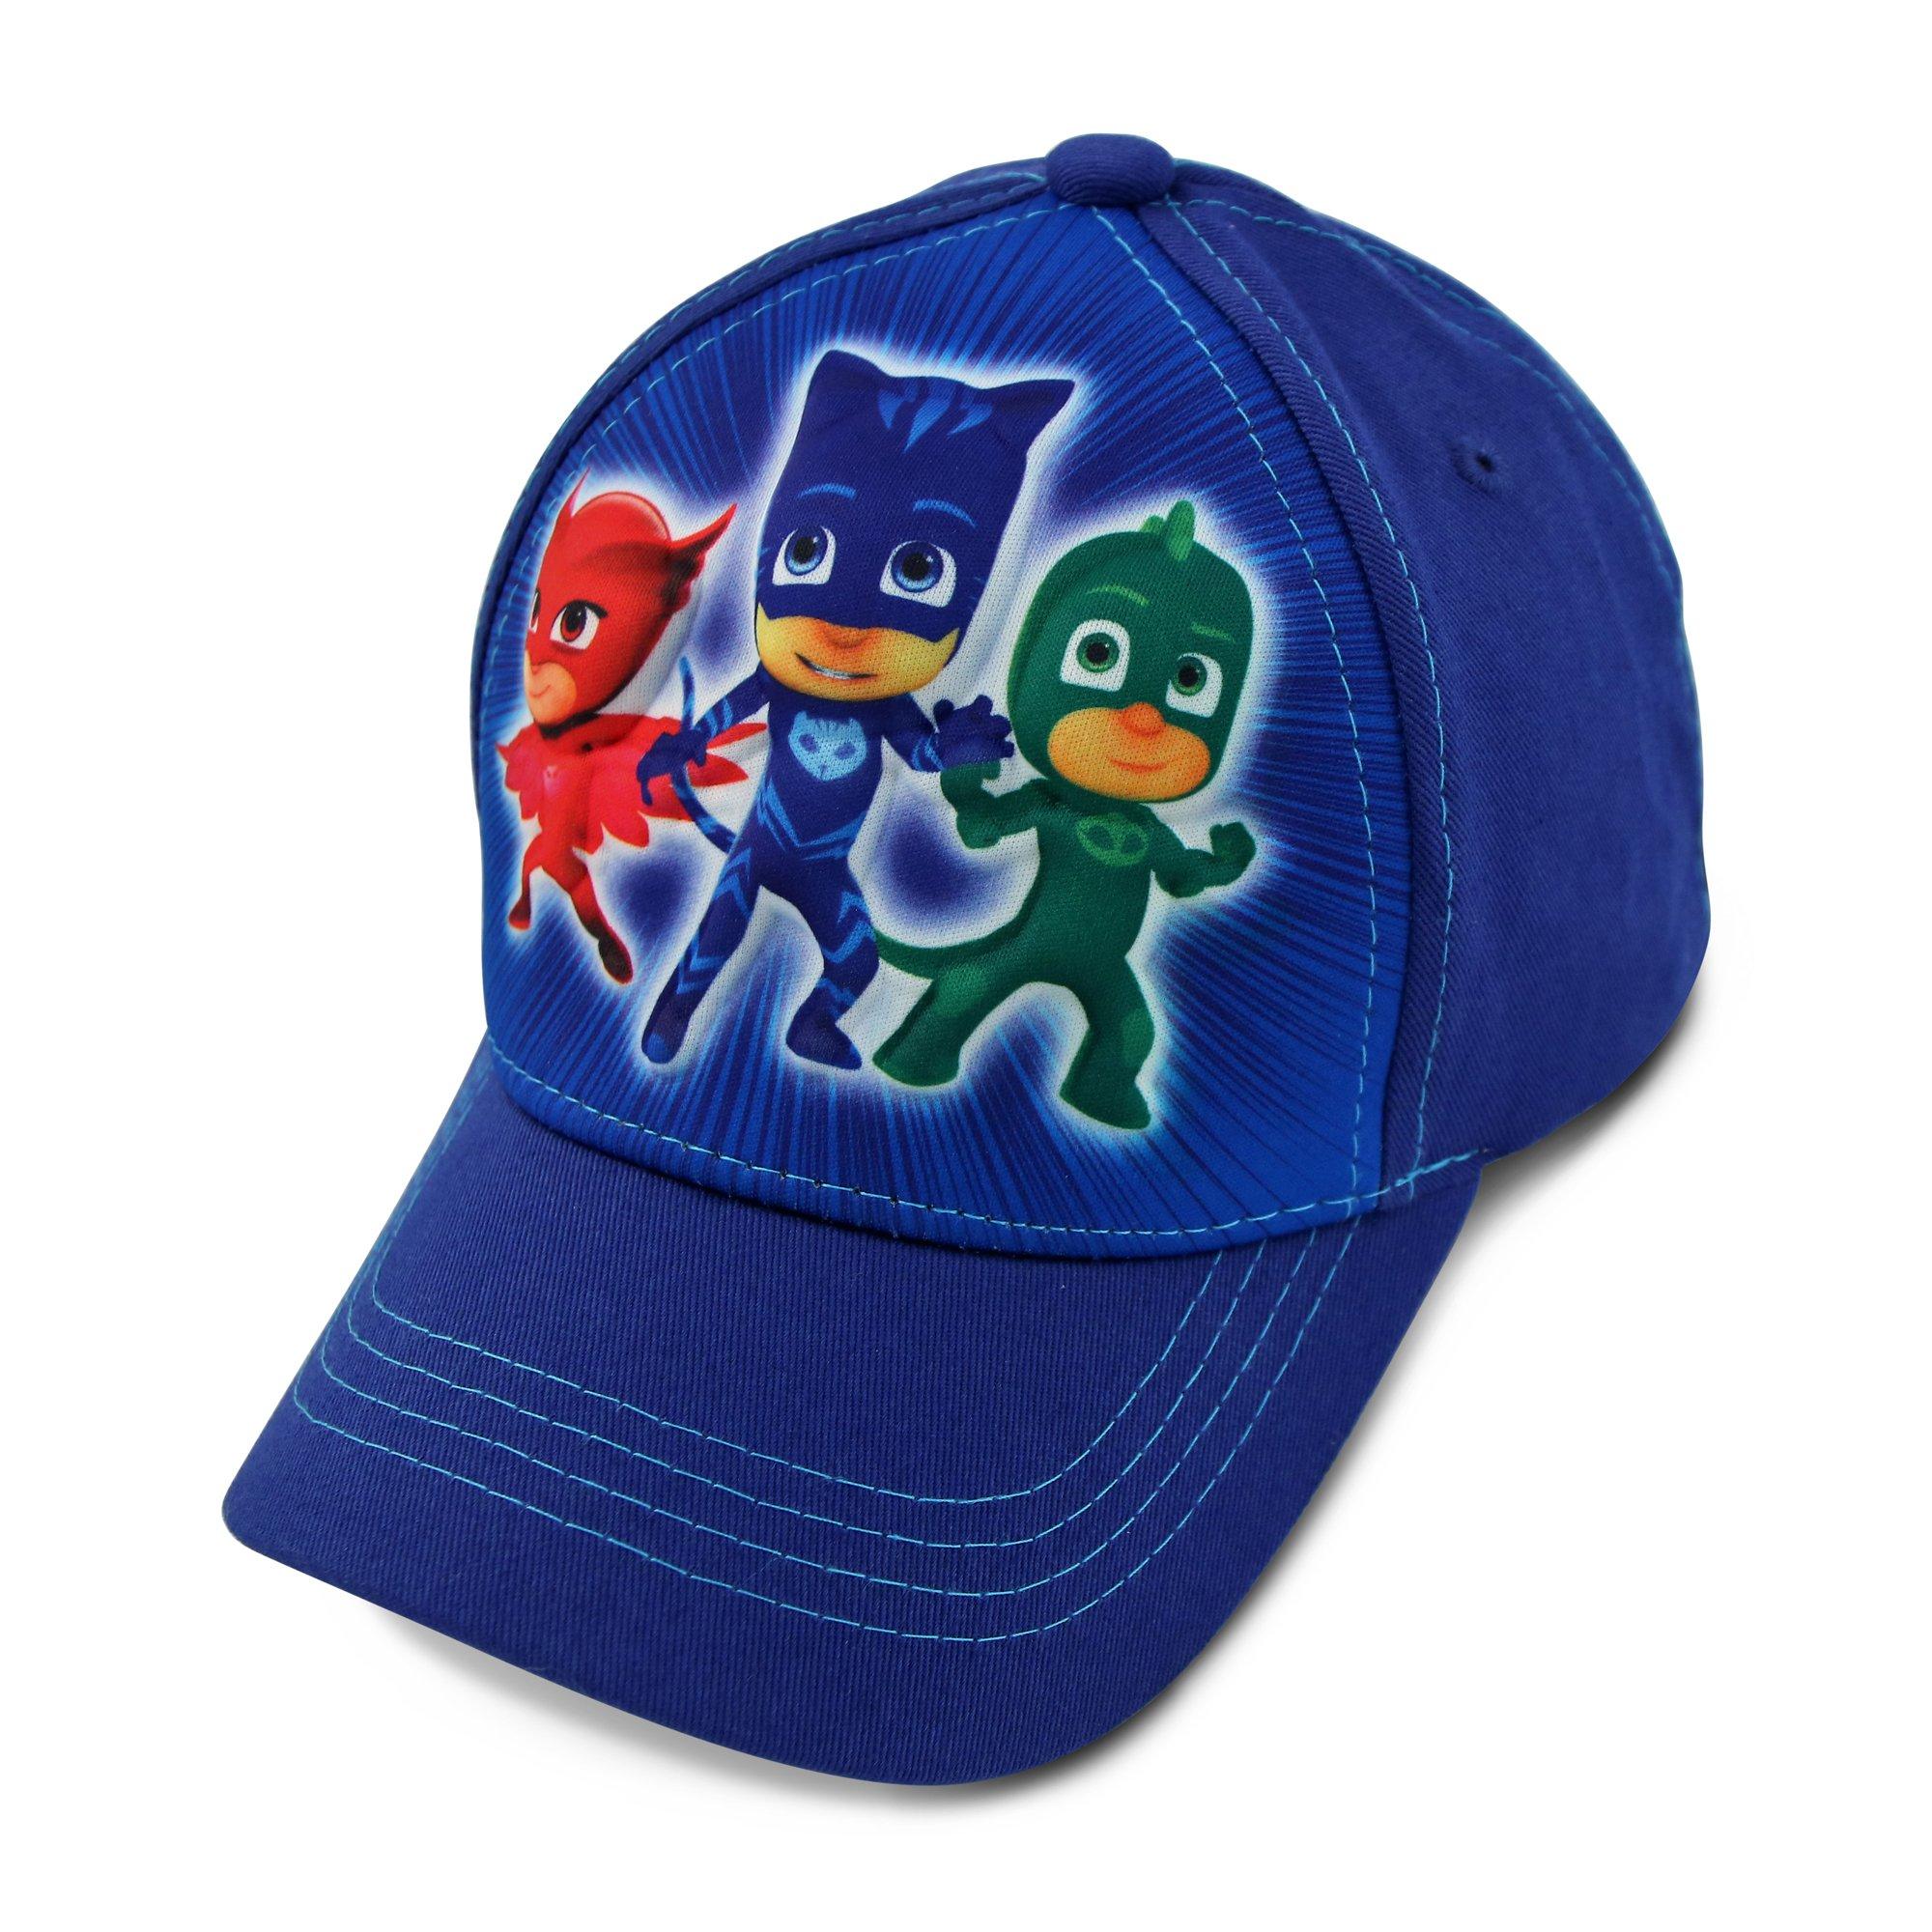 PJ Masks Little Boys Character 3D Pop Baseball Cap, Blue, Age 4-7